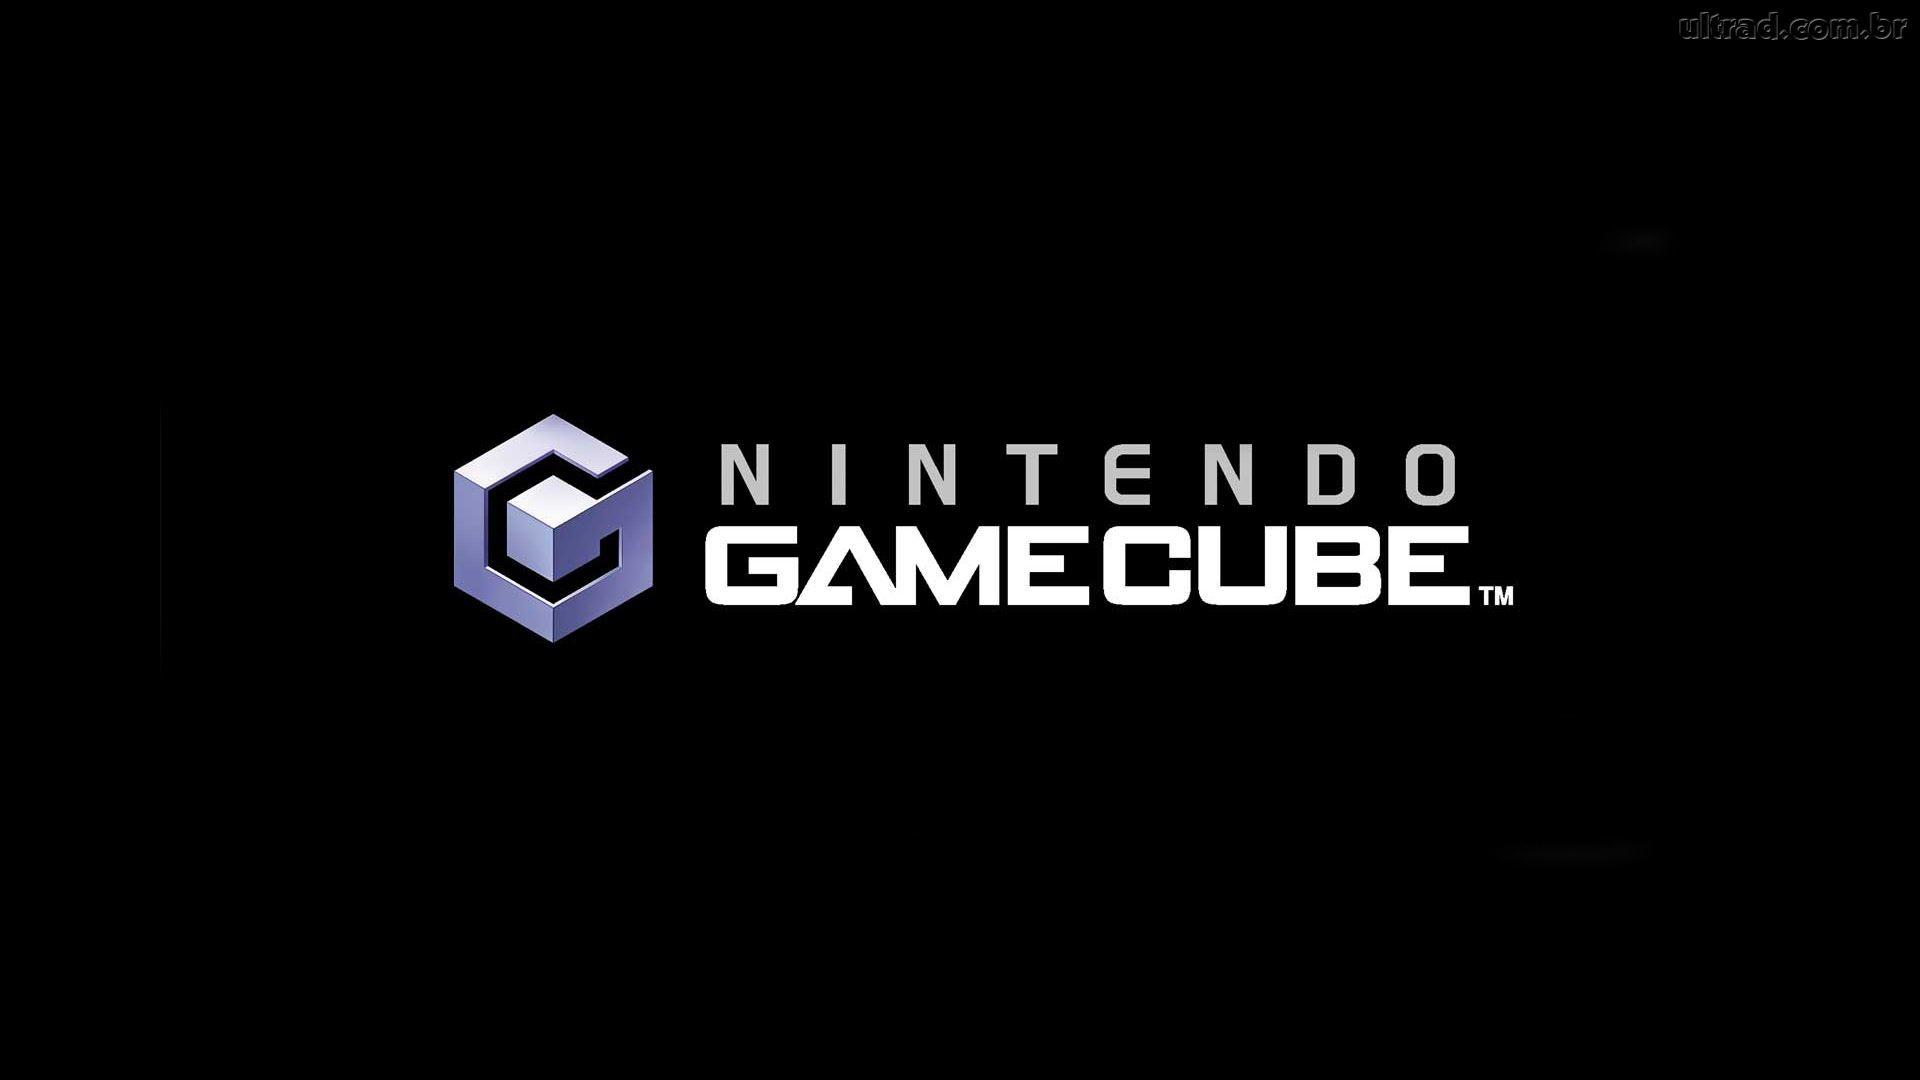 Gamecube Wallpaper (62+ images)